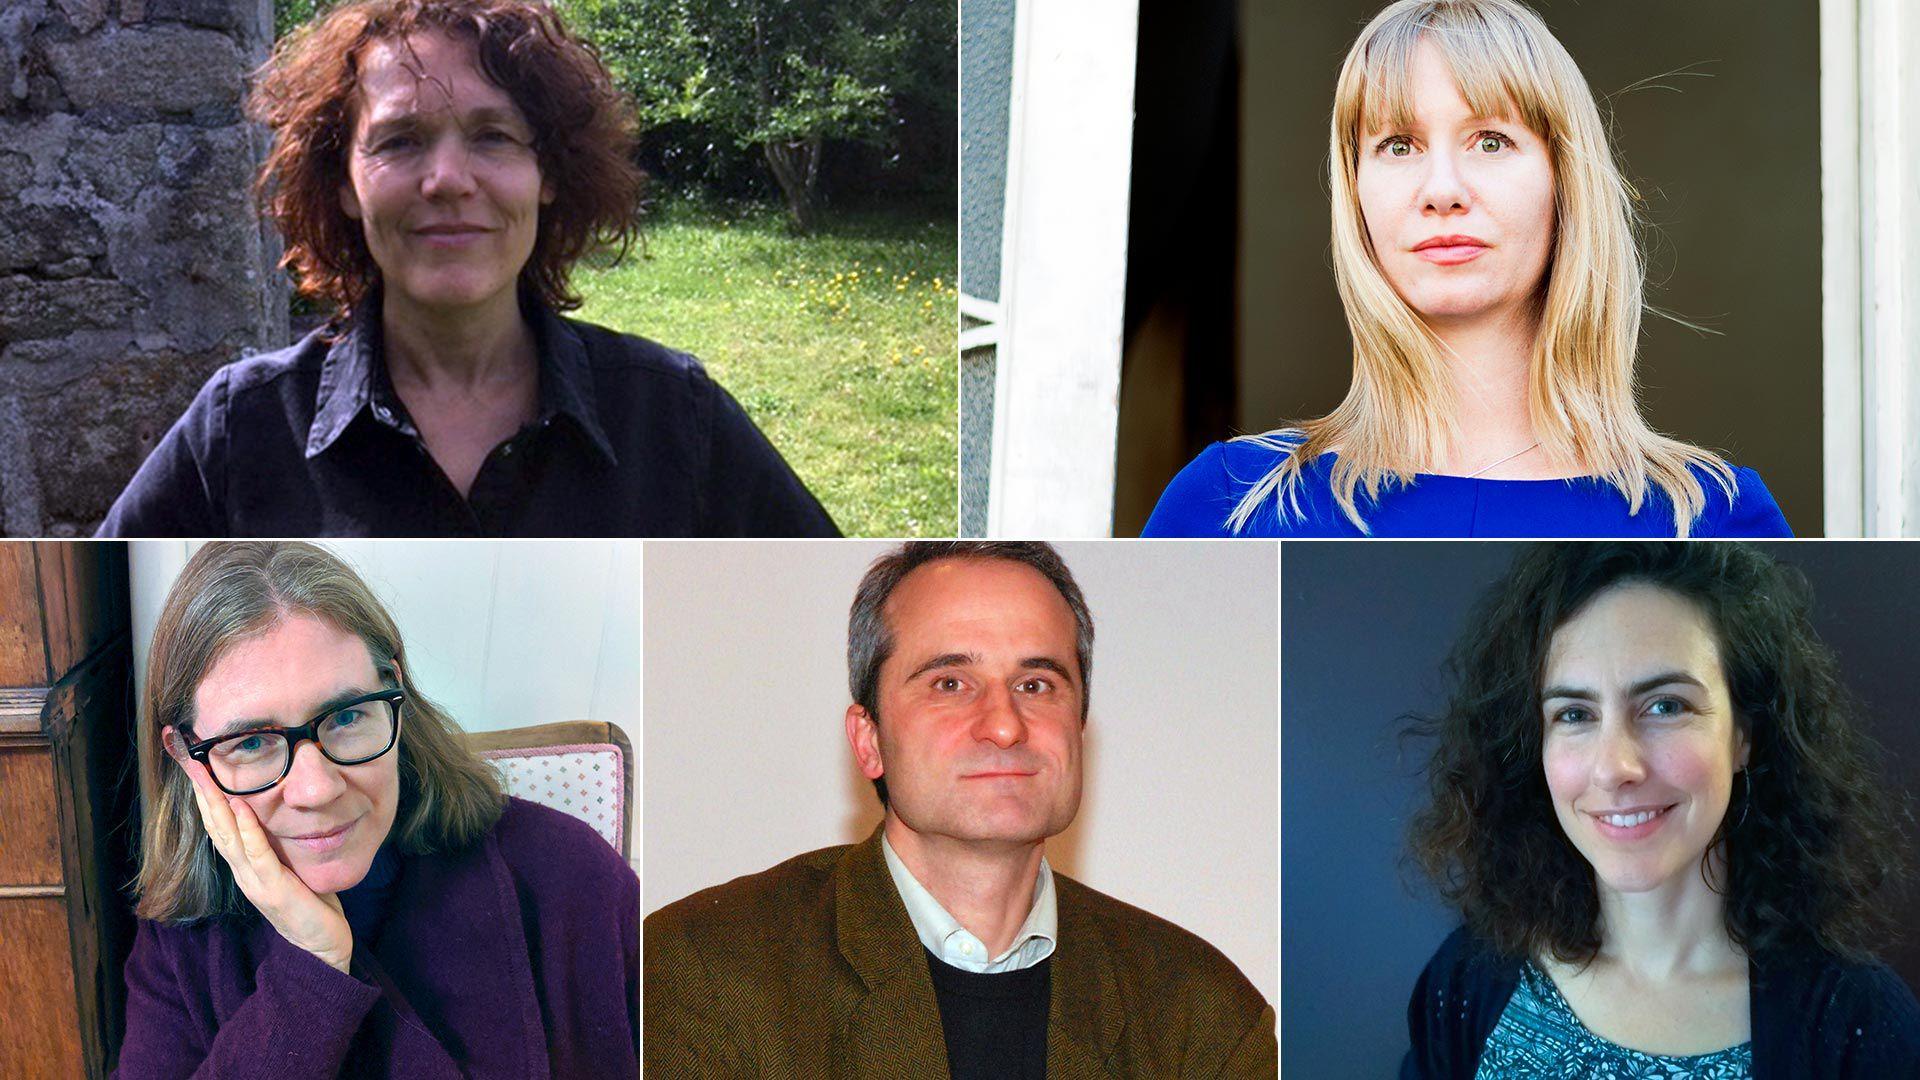 Arriba, de izq. a der.: Isabelle Cugnon y Megan McDowell. Abajo: Fiona Mackintosh, Peter Kultzen e Iona Macintyre